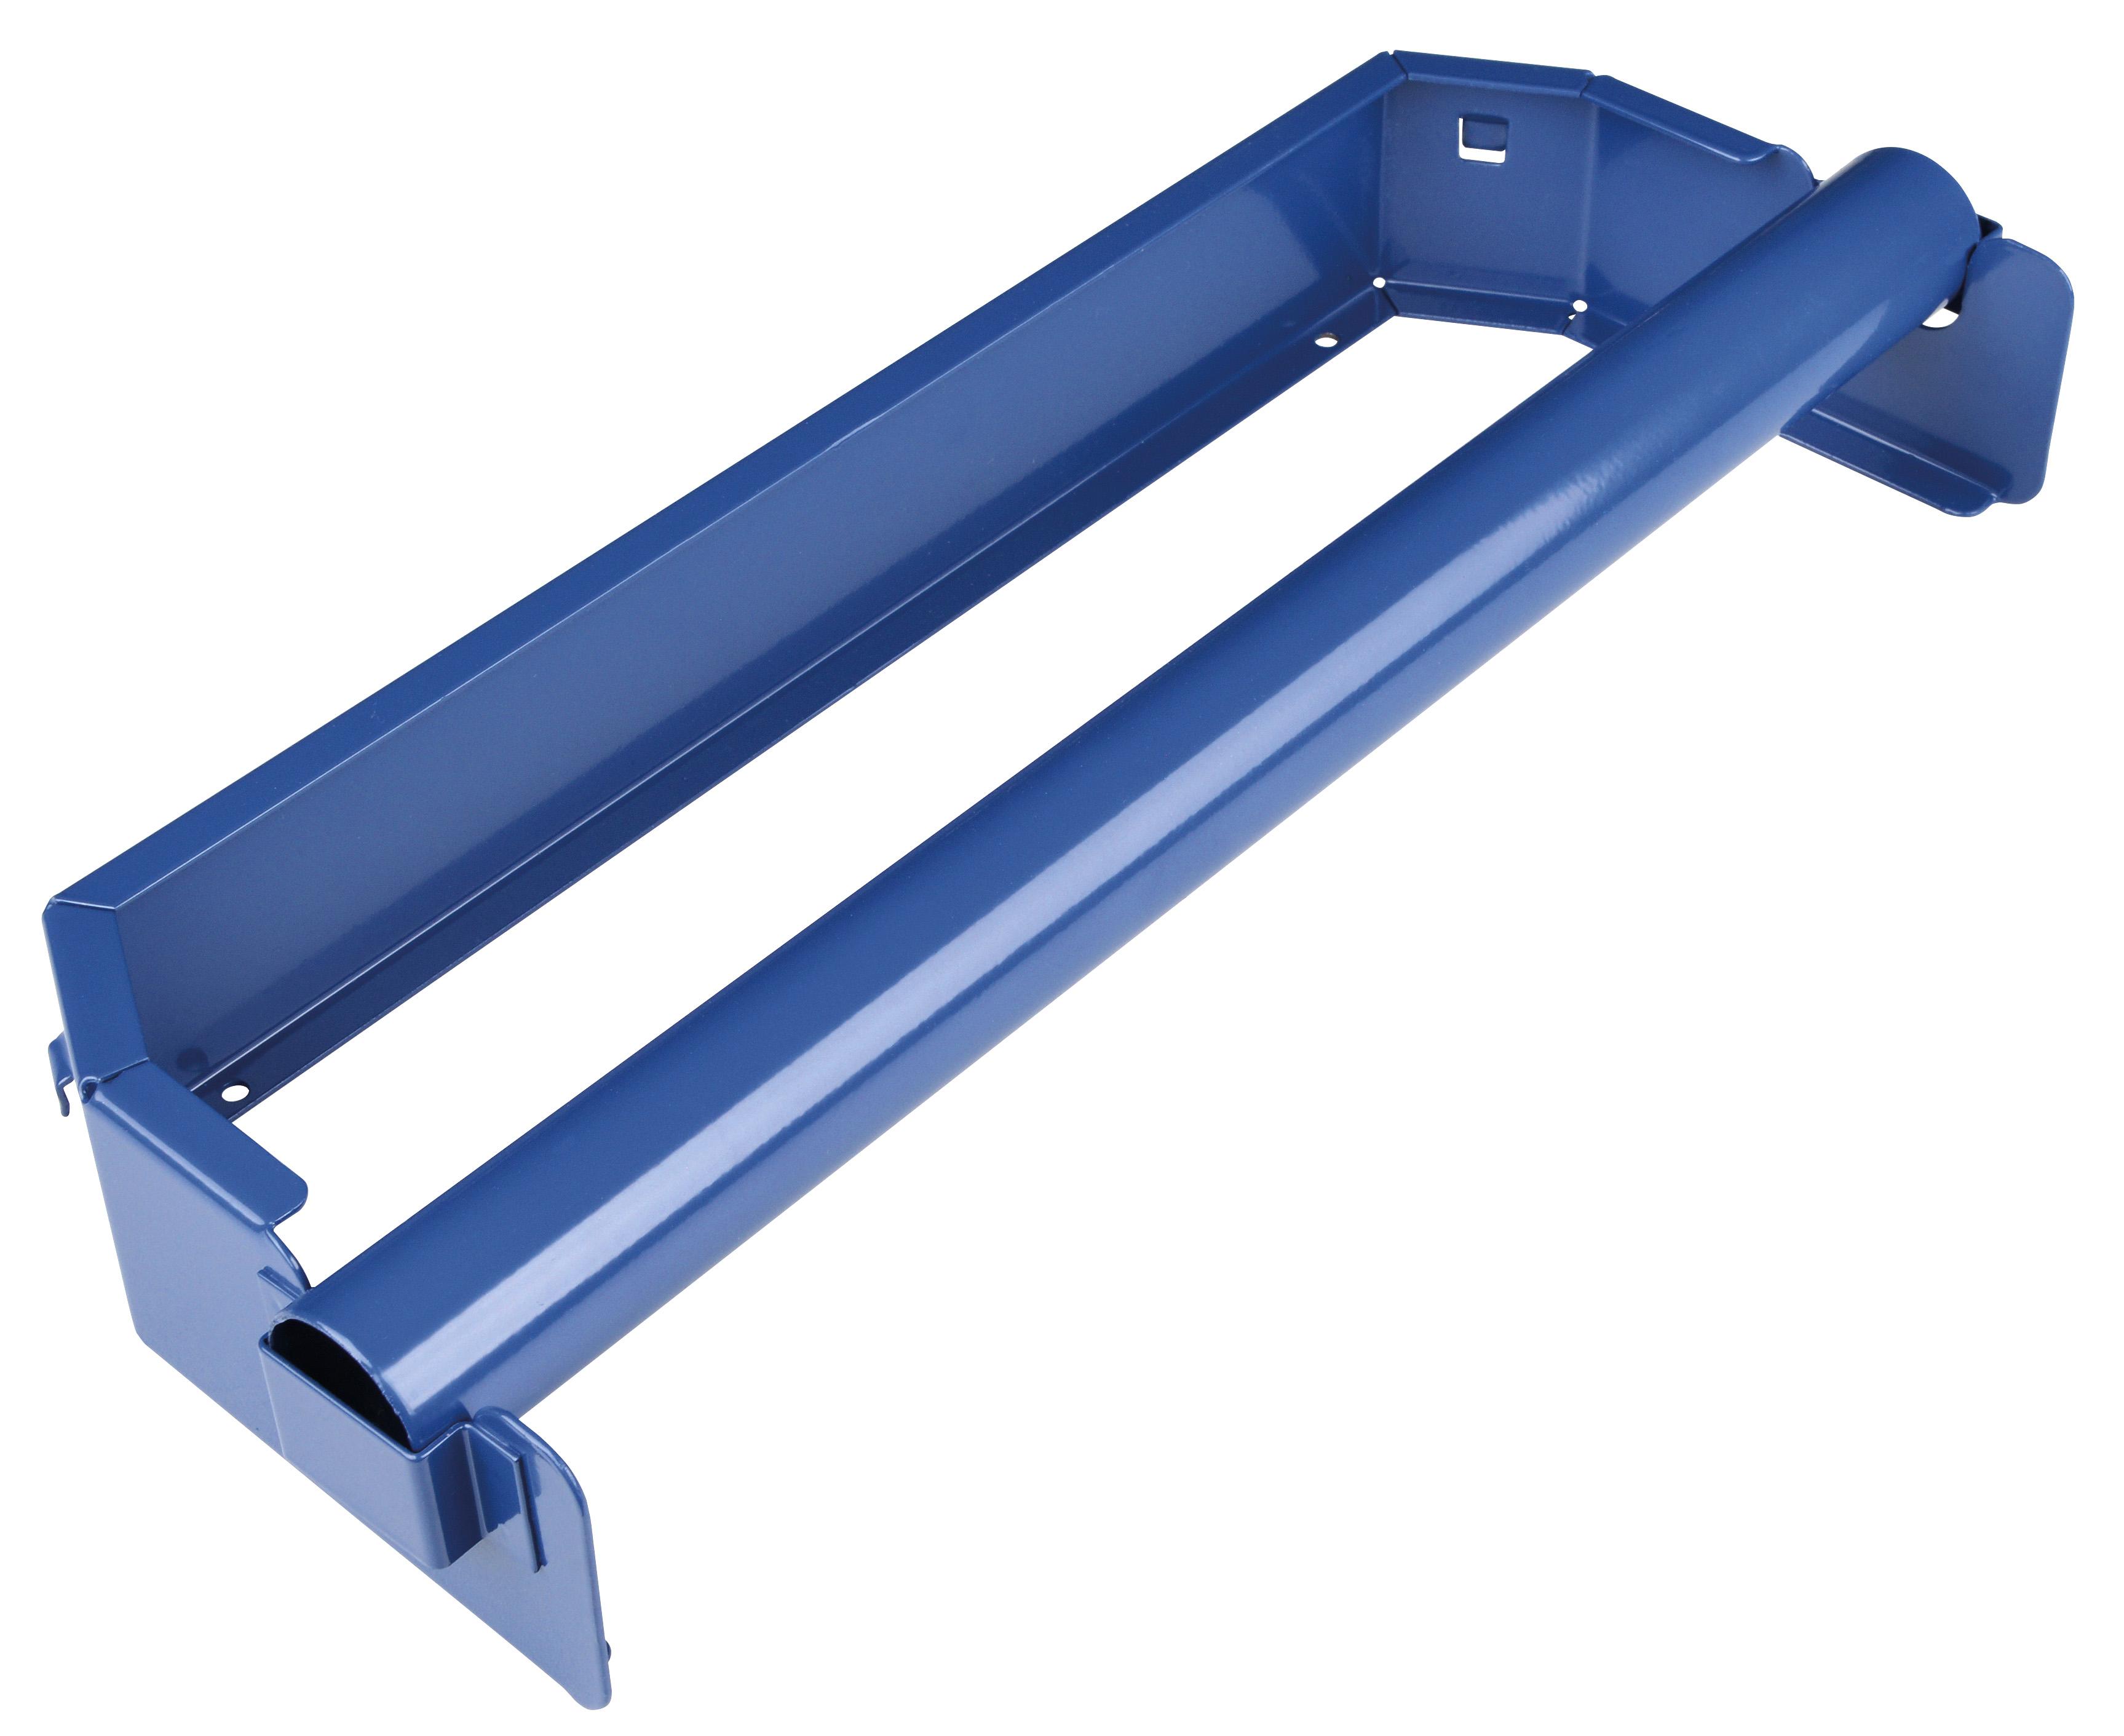 Papierrollenhalter Image